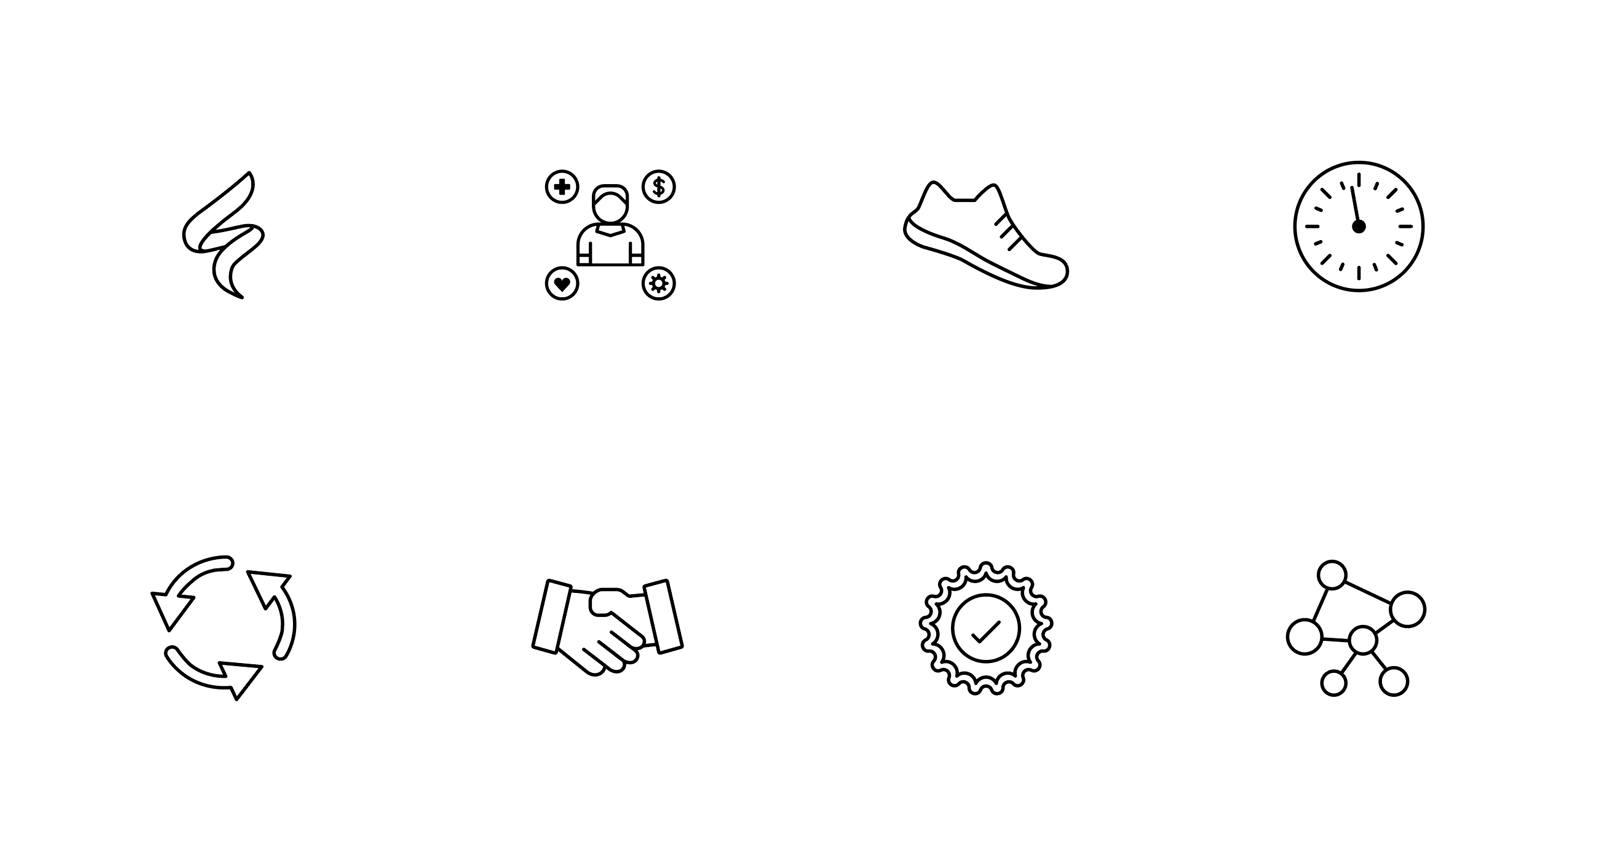 Icon set for Midmark brand